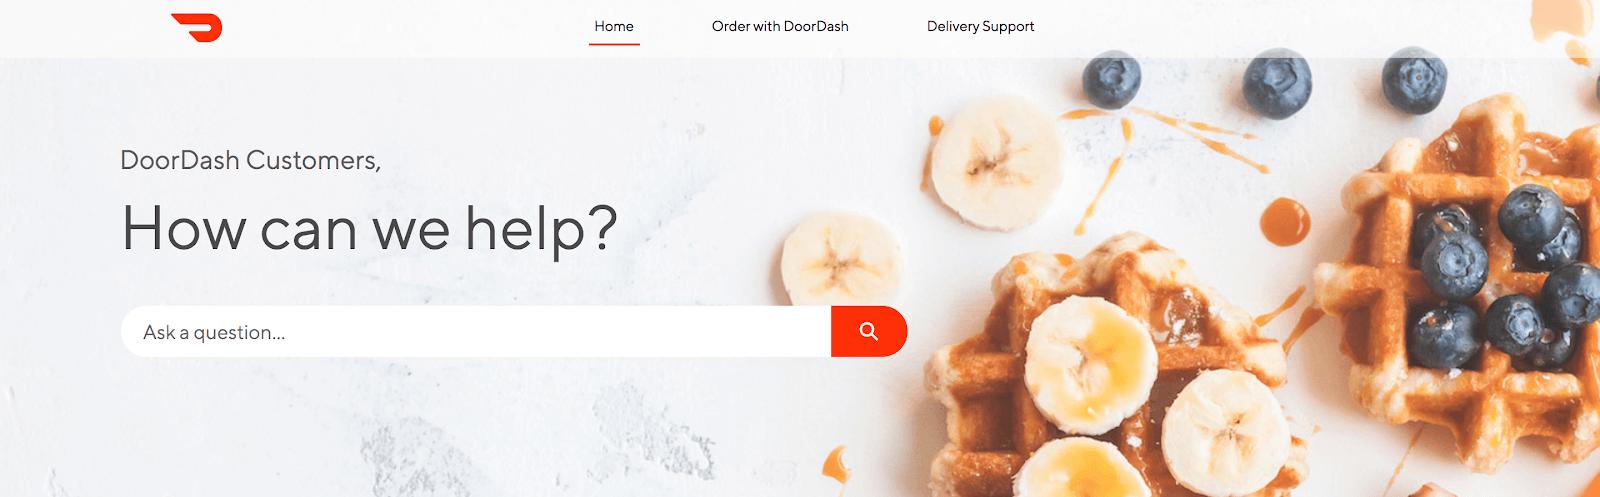 DoorDash Customer Service for Customers, Drivers, and Merchants